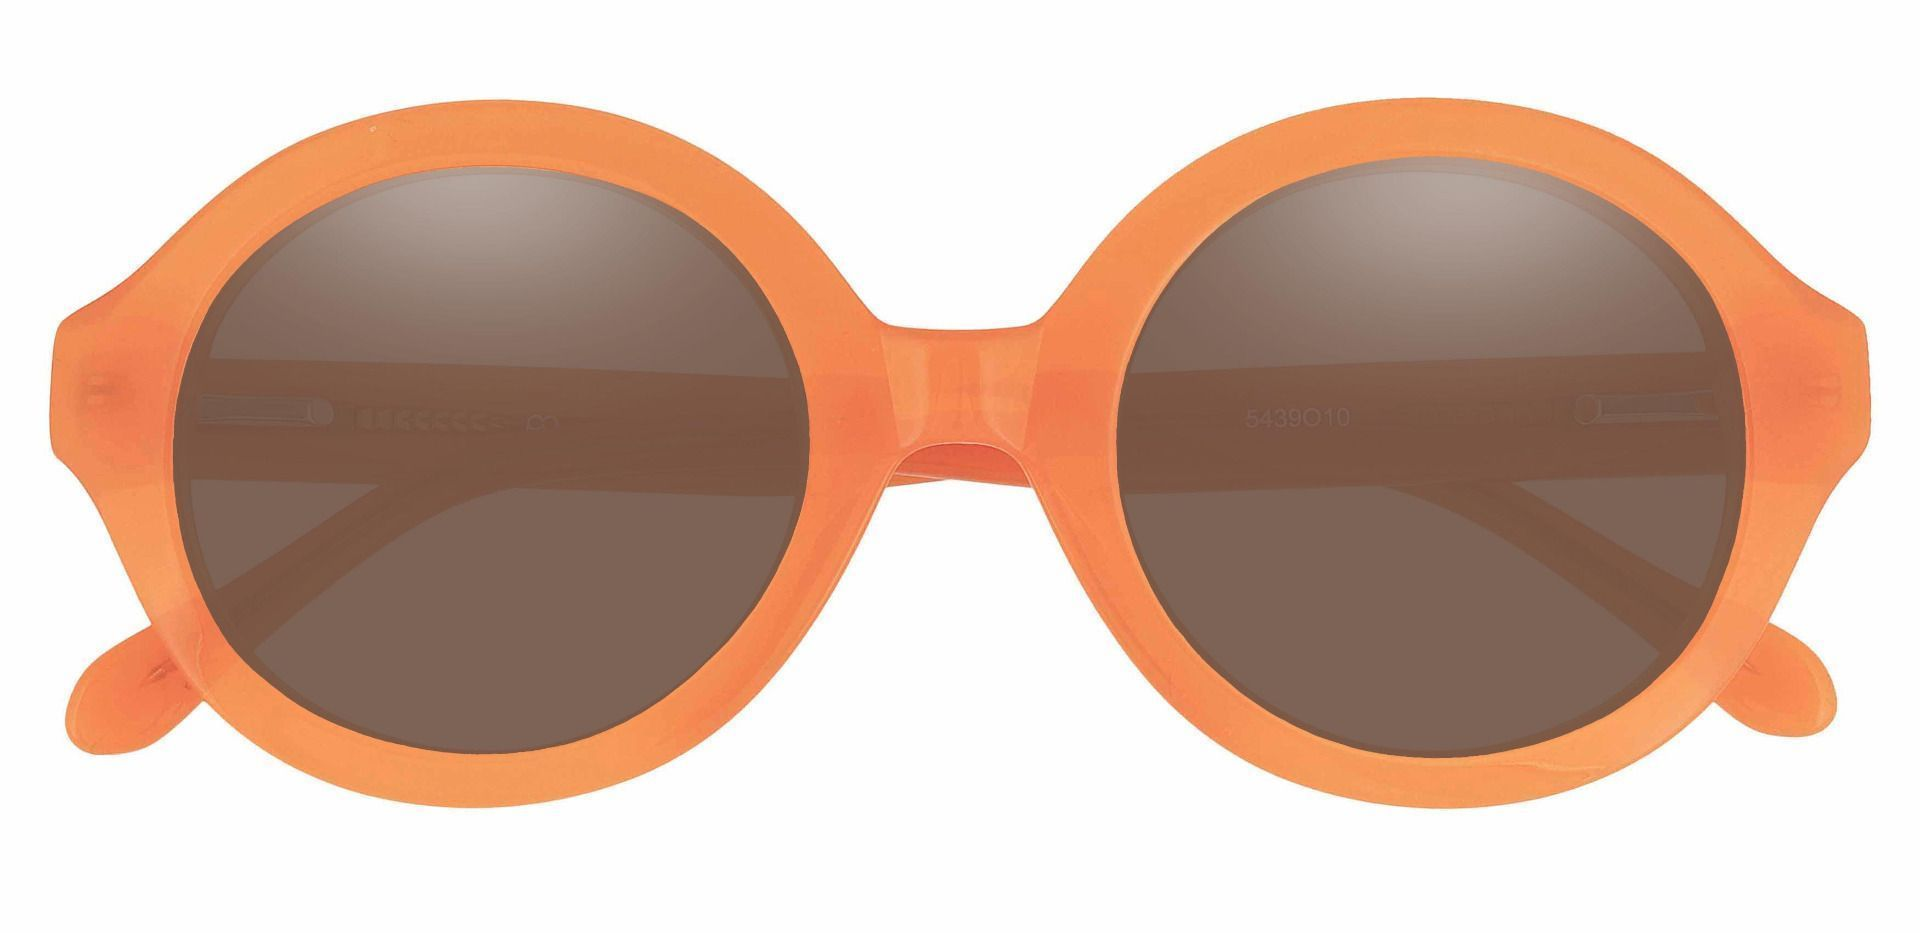 Clara Round Non-Rx Sunglasses - Orange Frame With Brown Lenses